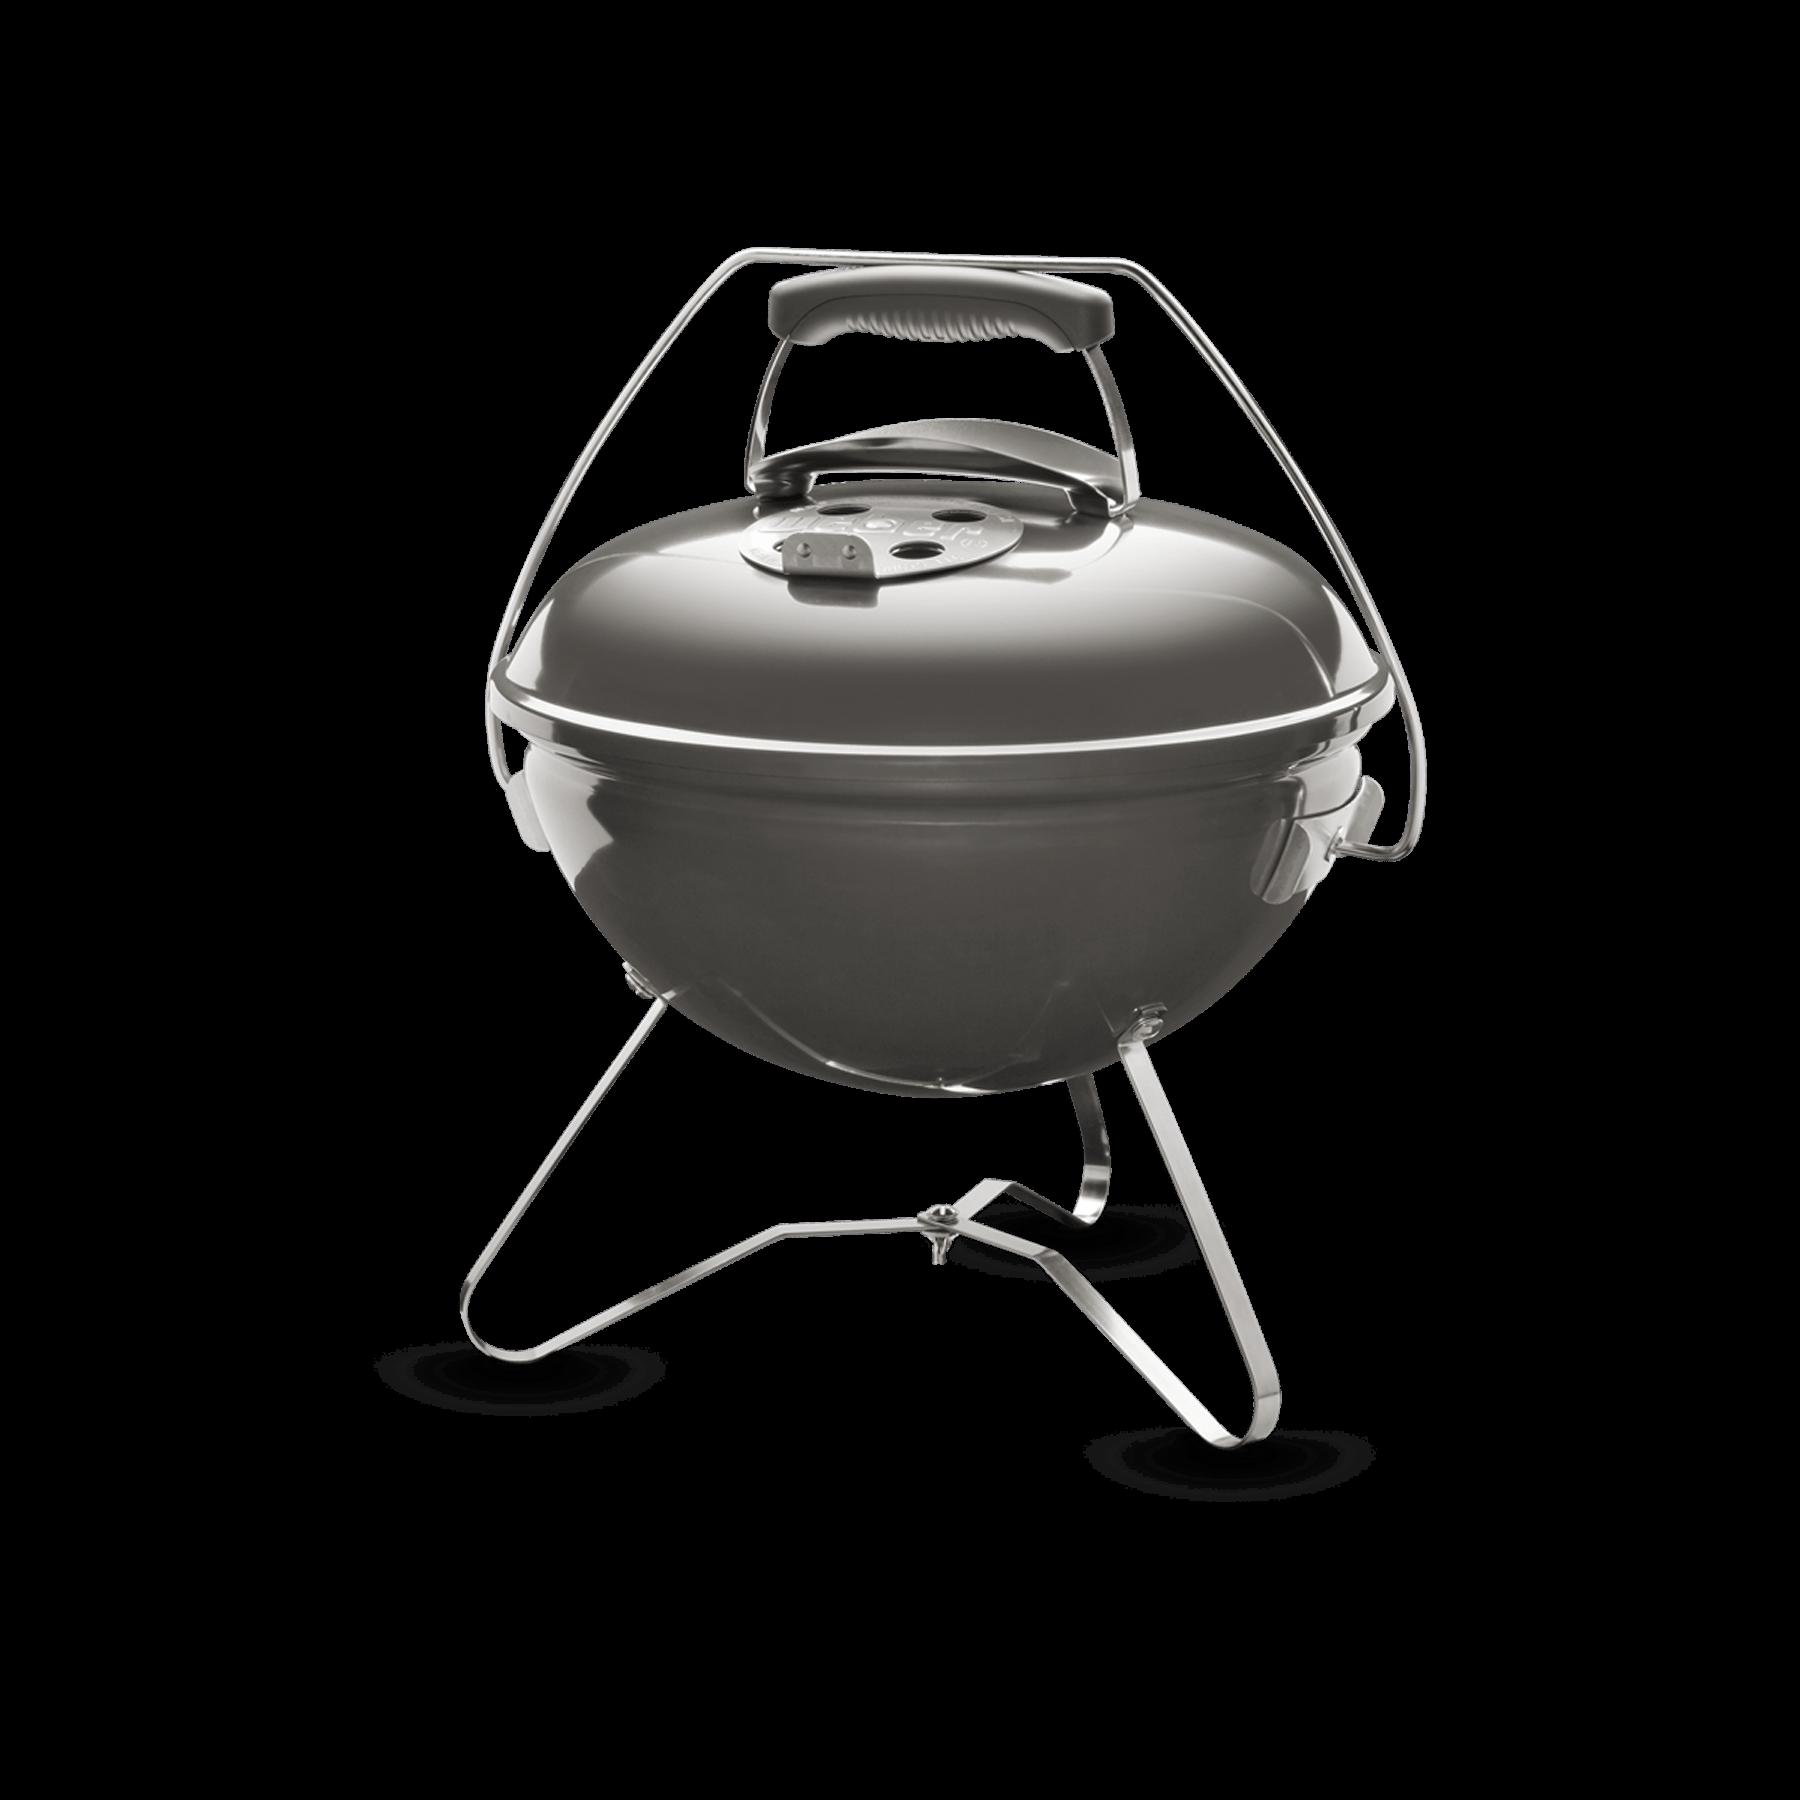 Smokey Joe® Premium Charcoal Barbecue 37cm